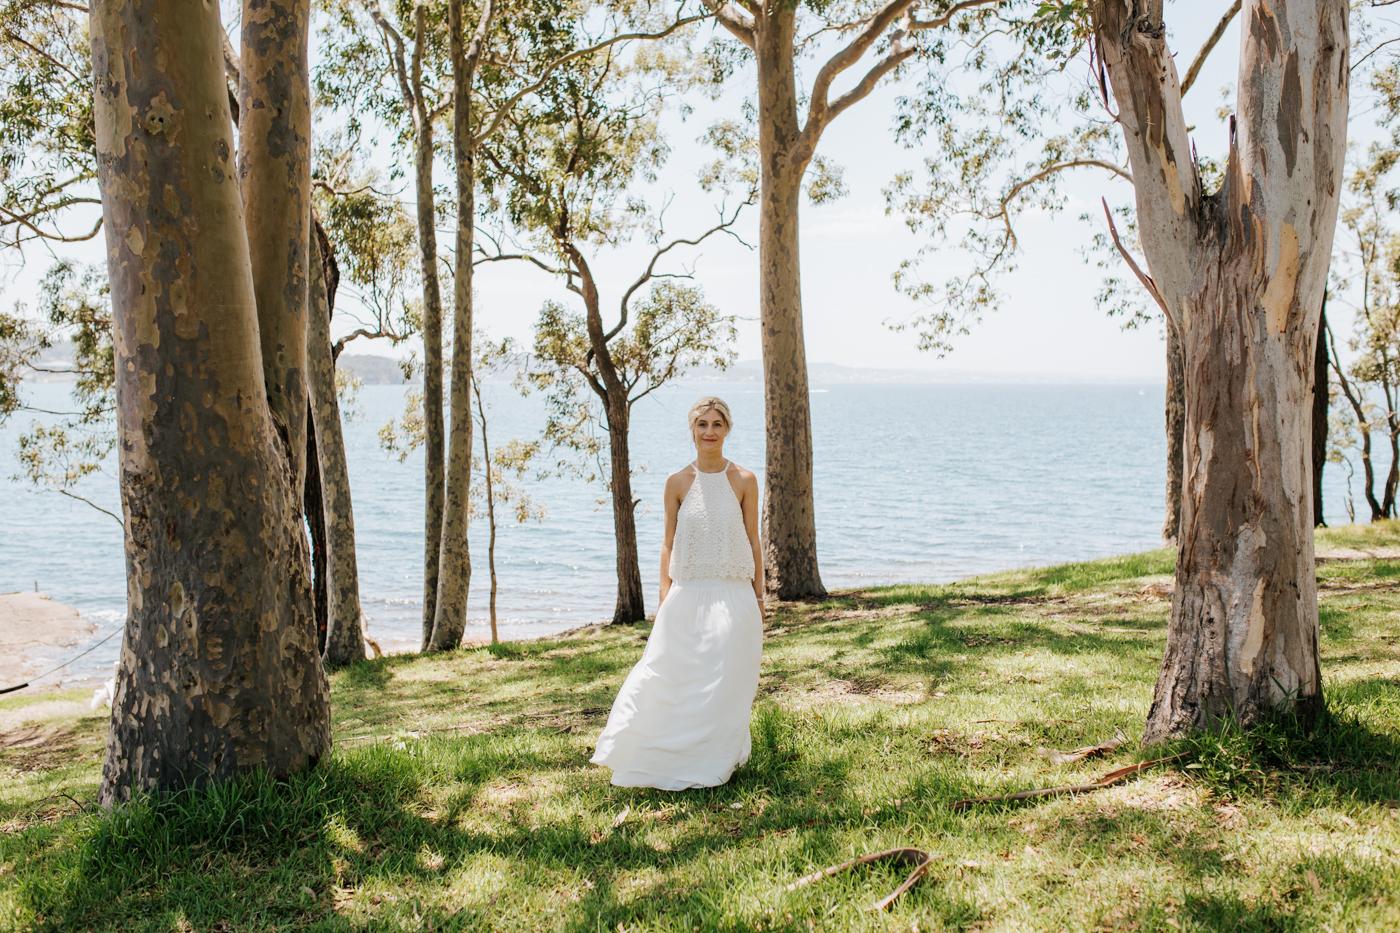 Emma & Ben - Lake Macquarie - Hunter Valley Wedding - Samantha Heather Photography-70.jpg